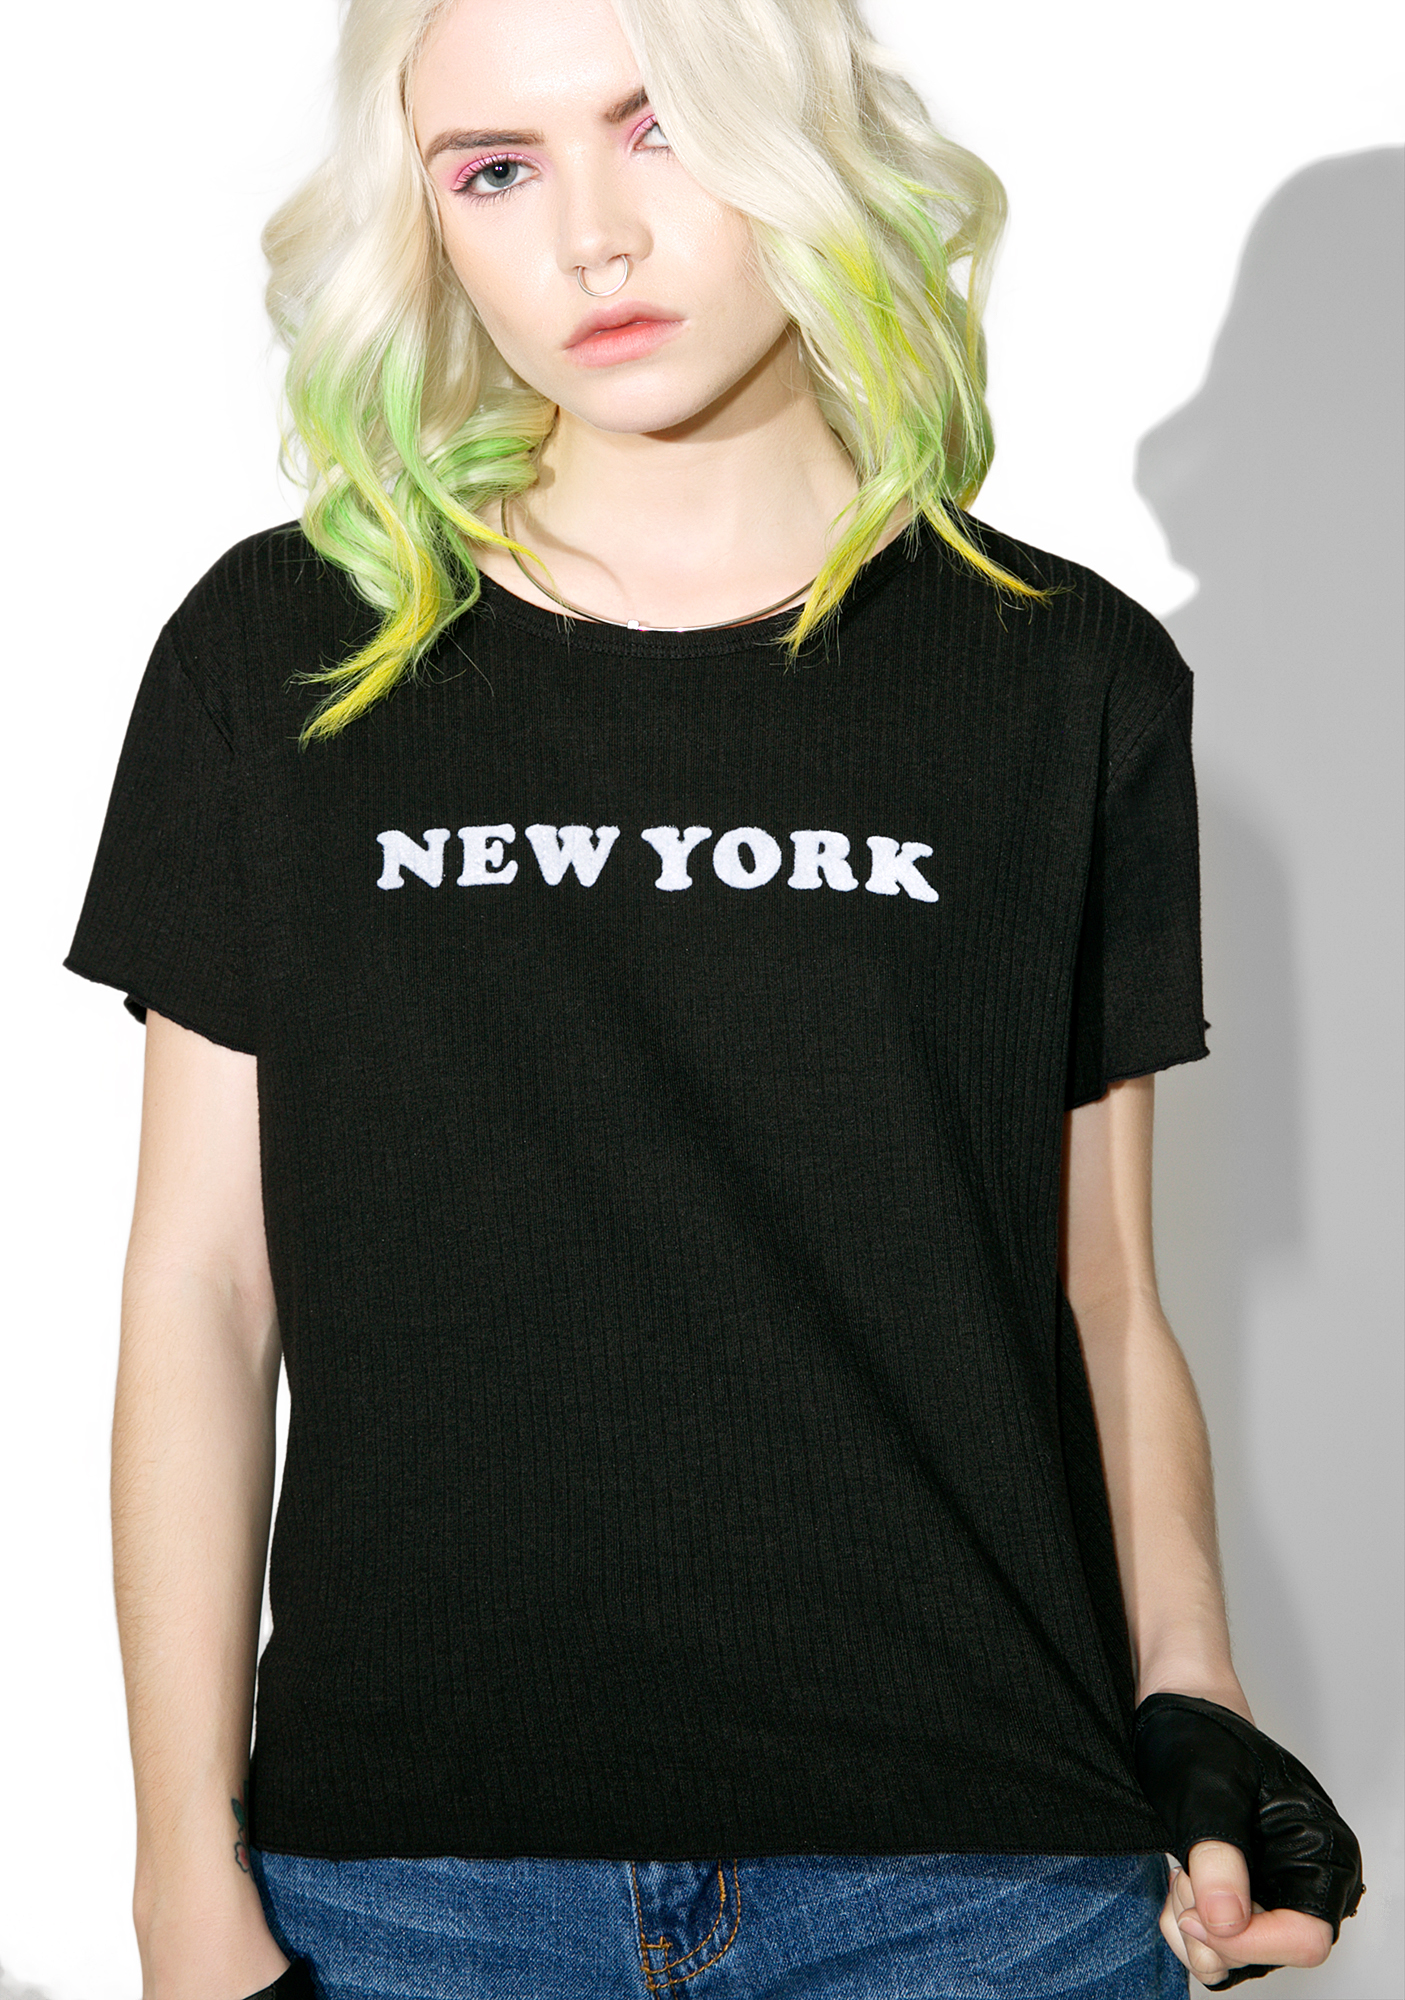 Daydreamer New York Tee